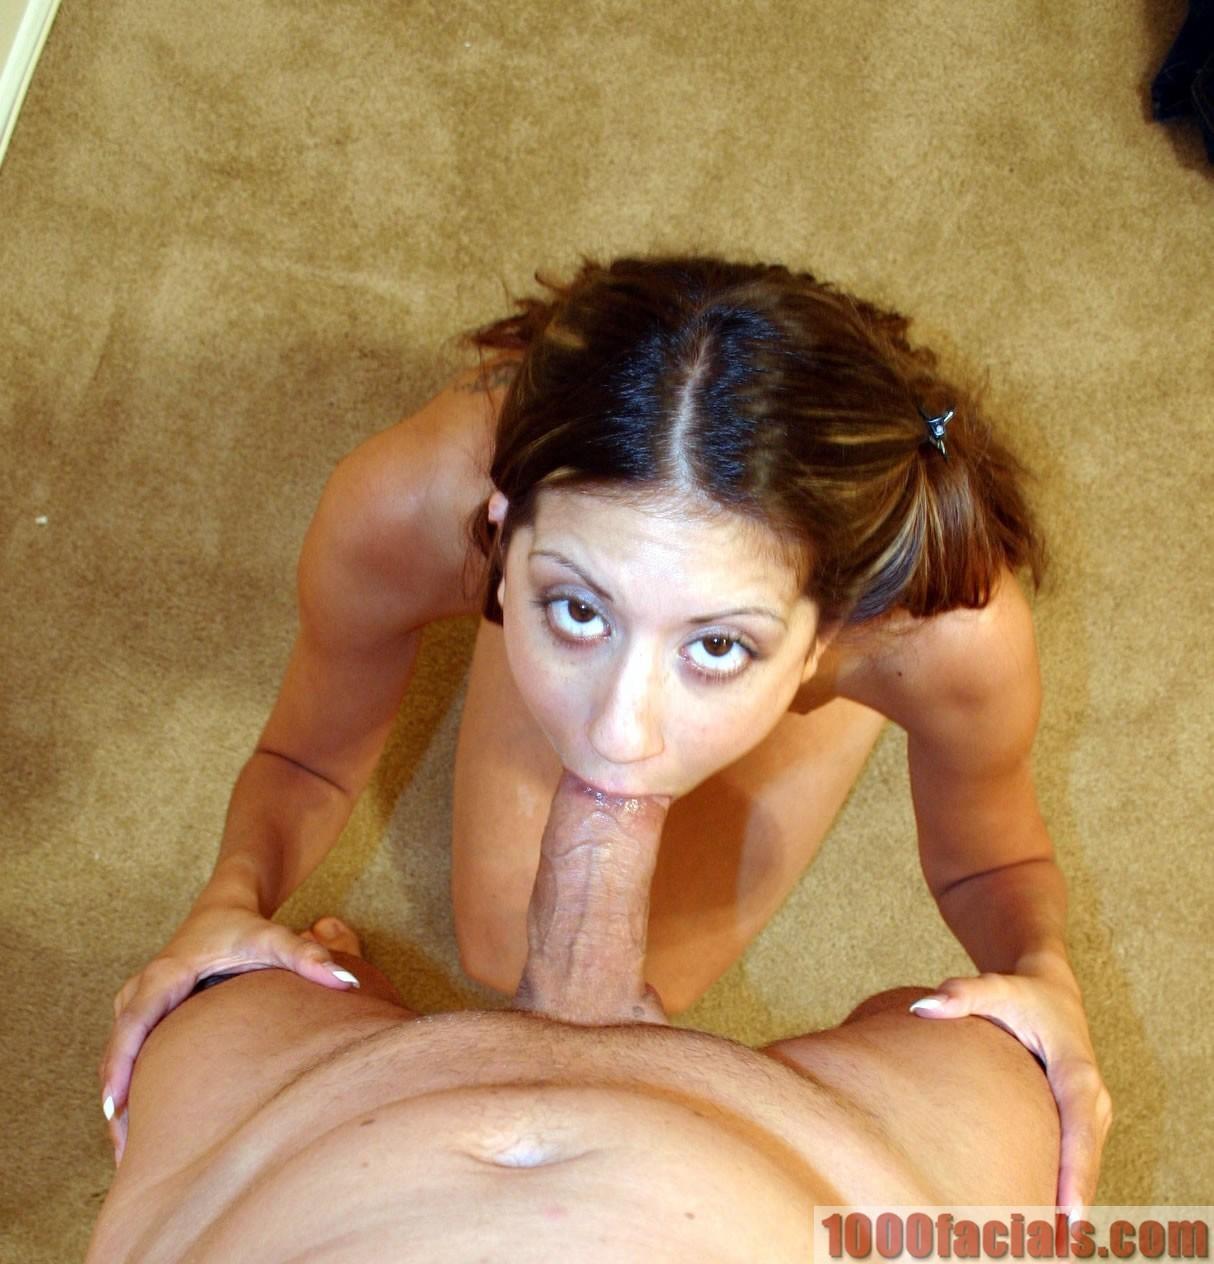 Amature homemade firsttime anal vids